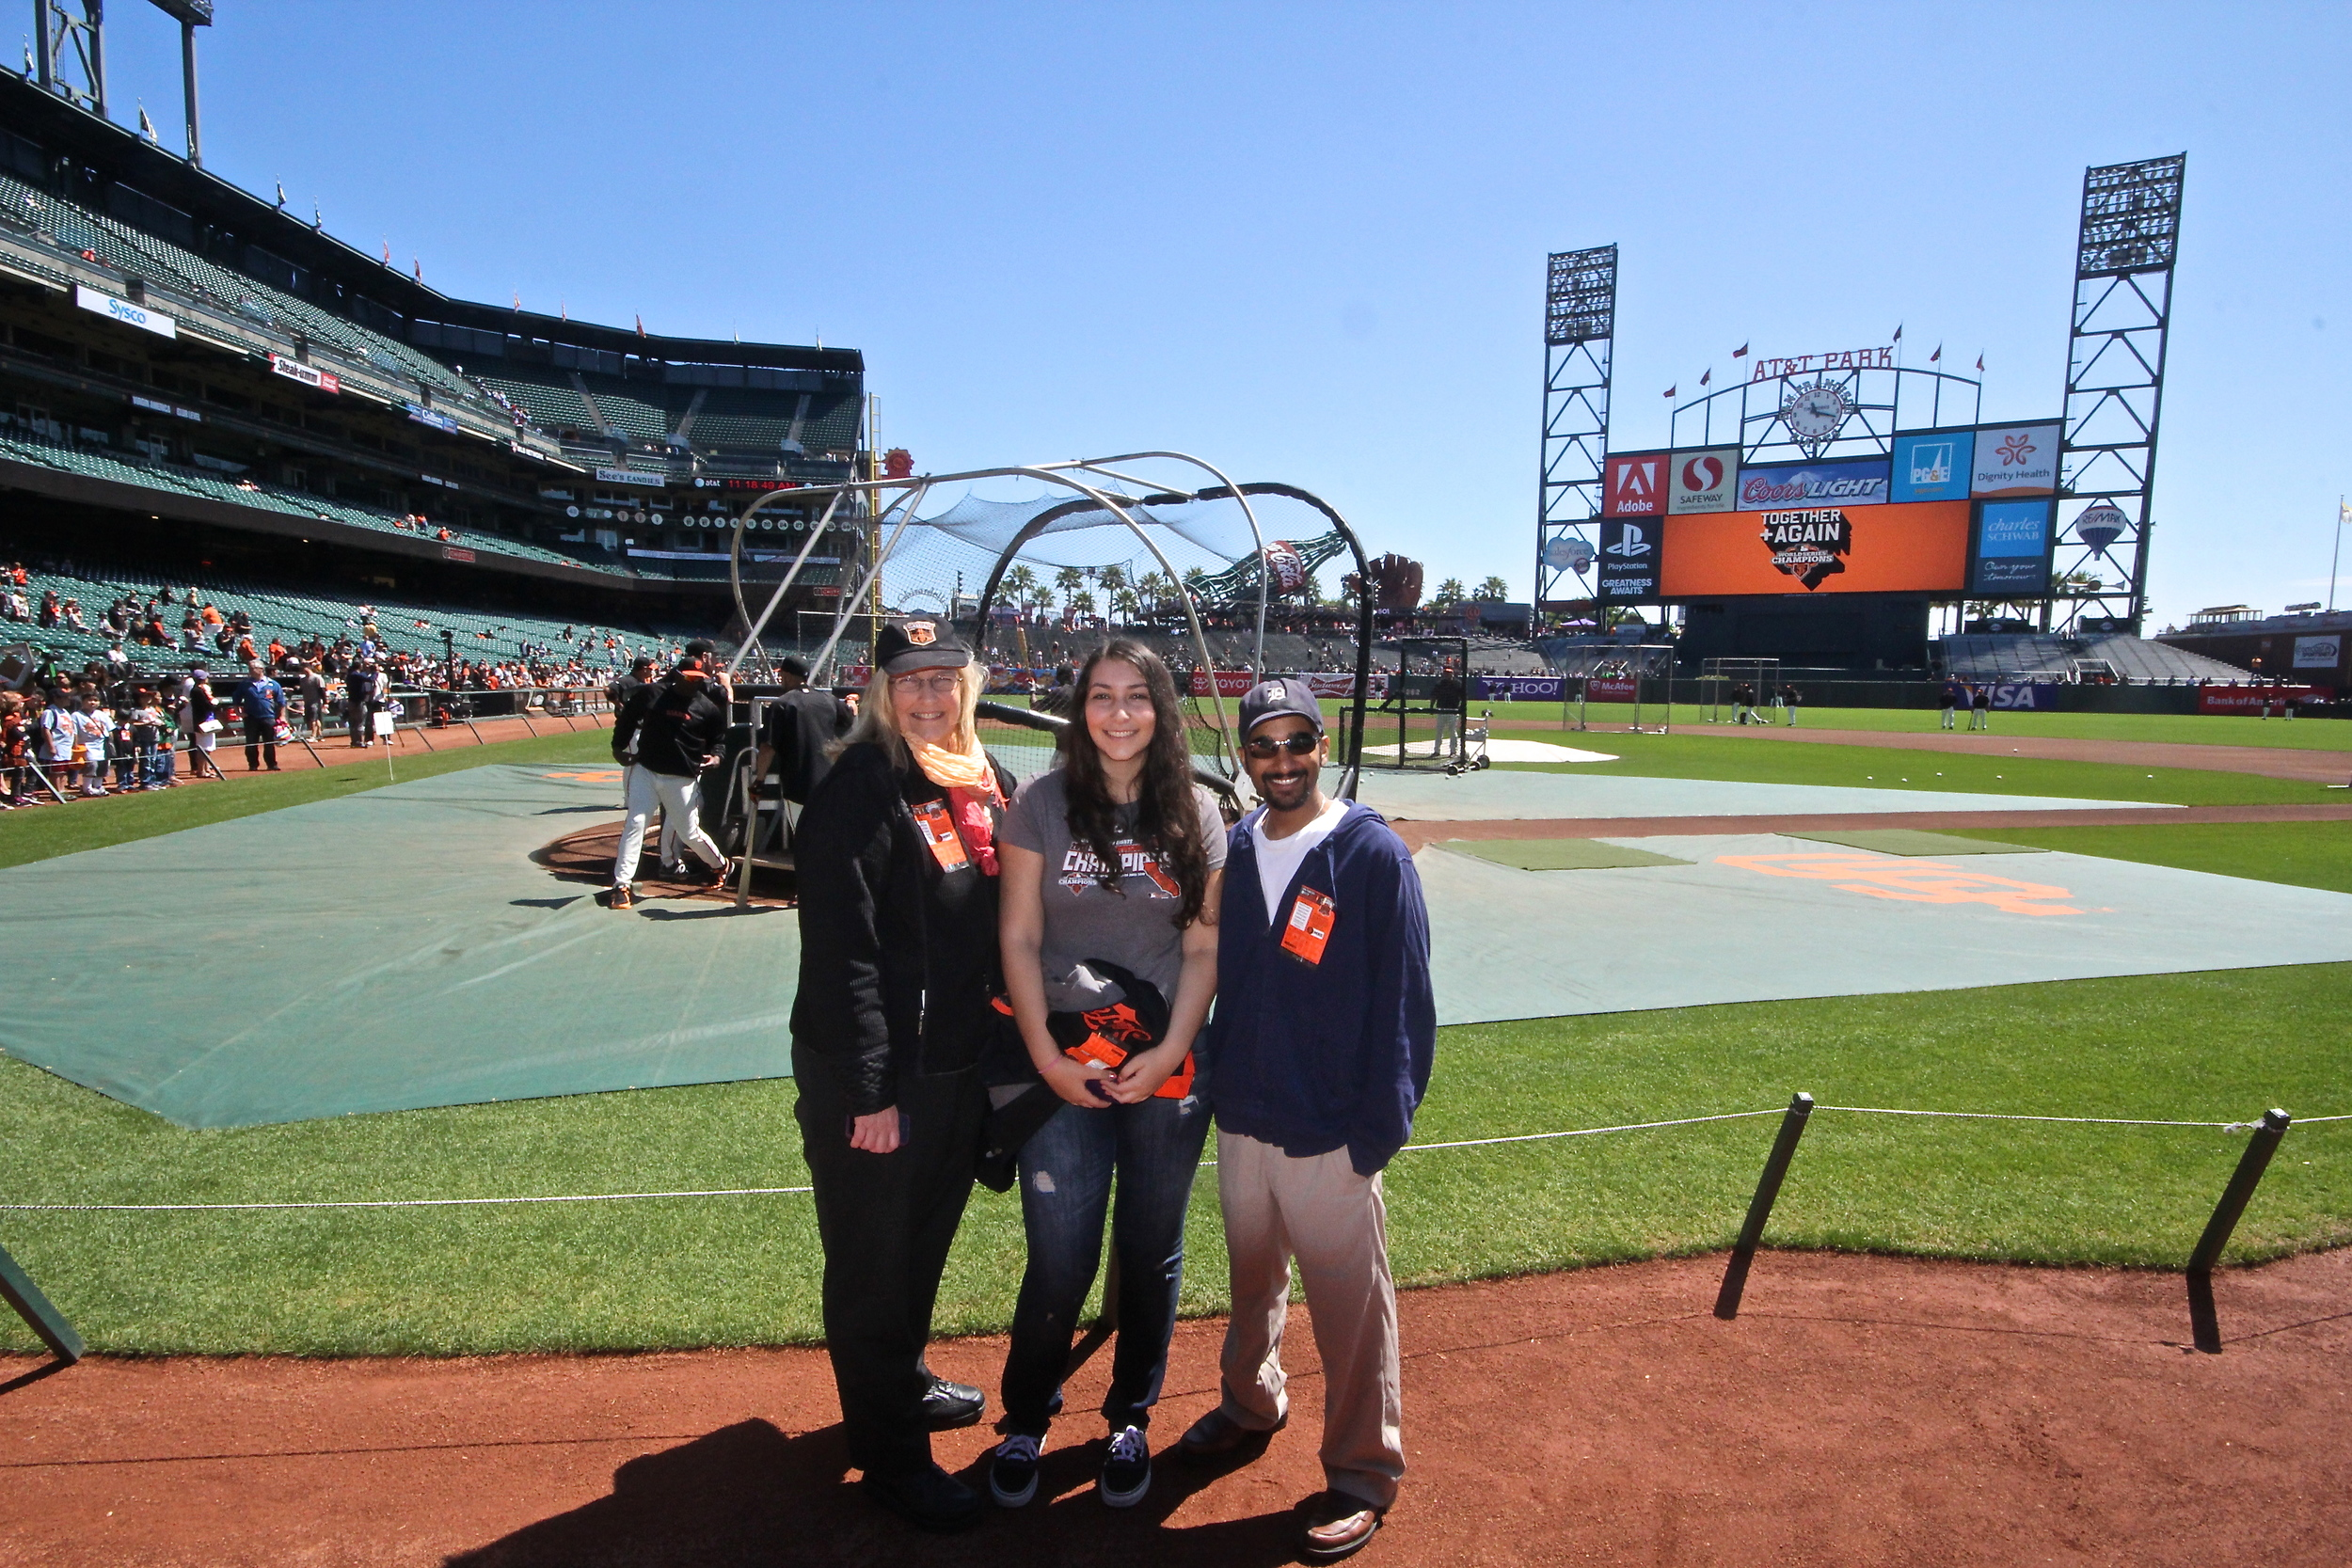 Barbara, Adela and me on the field at AT&T